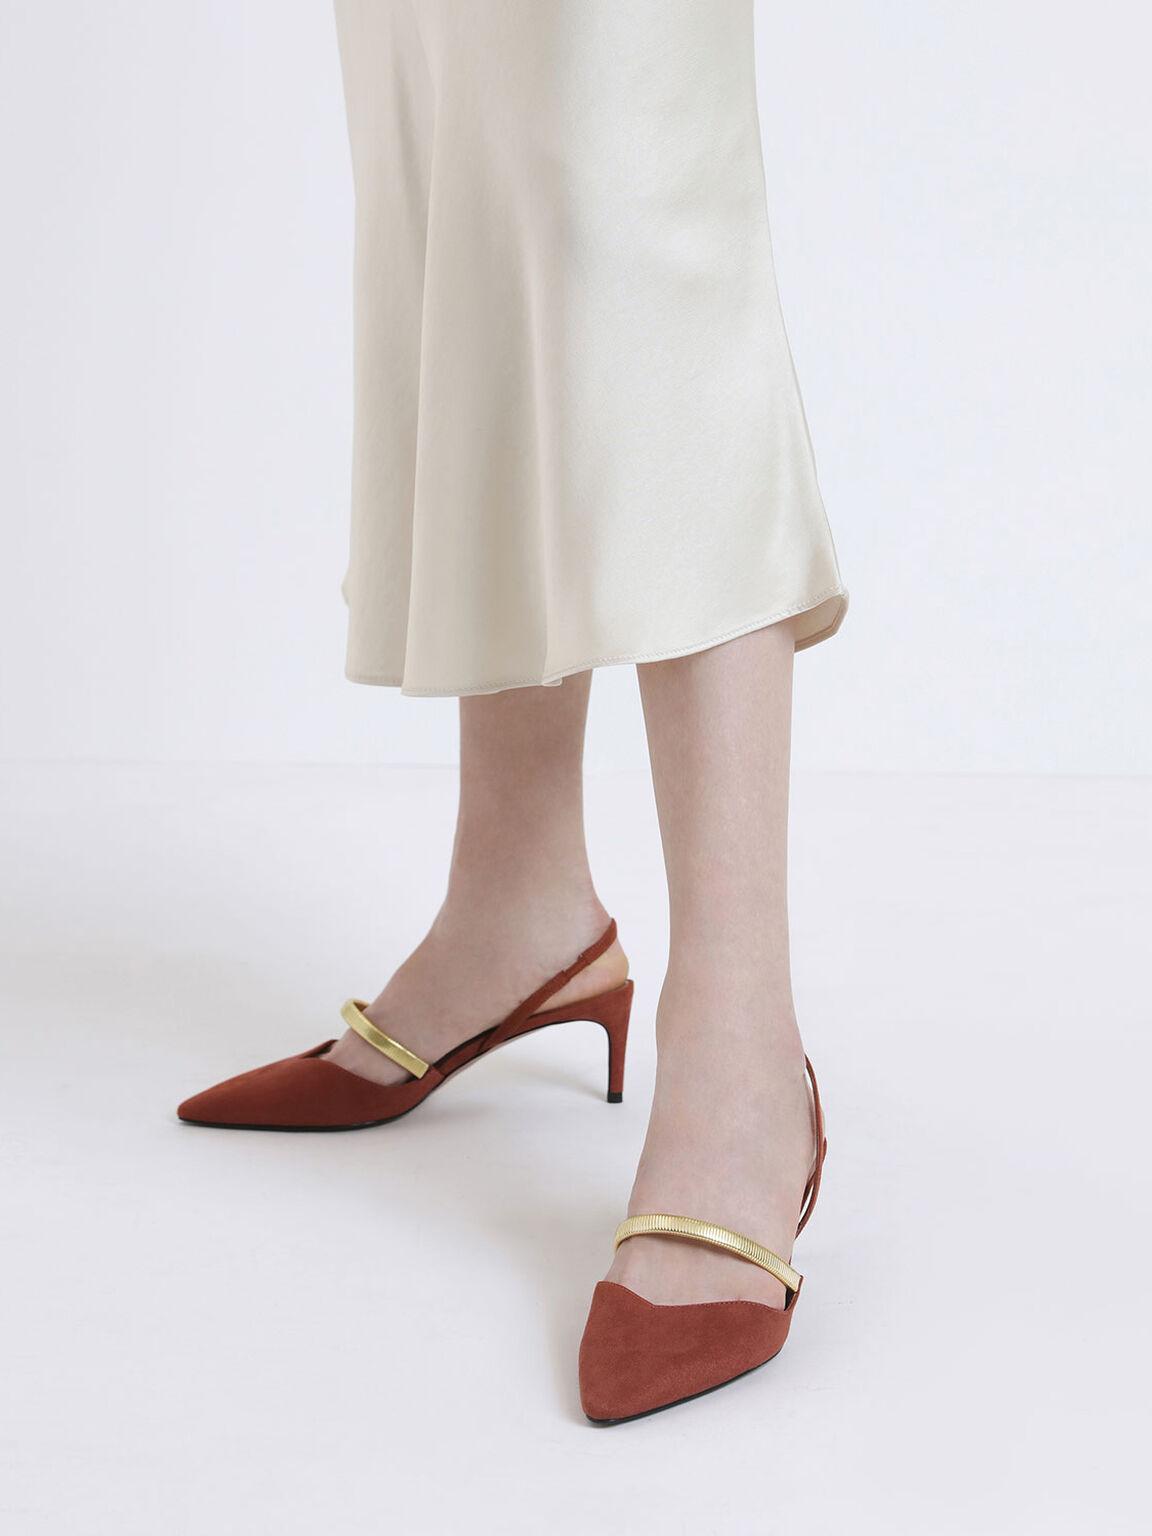 Gold Mary Jane Strap Textured Slingback Heels, Brick, hi-res